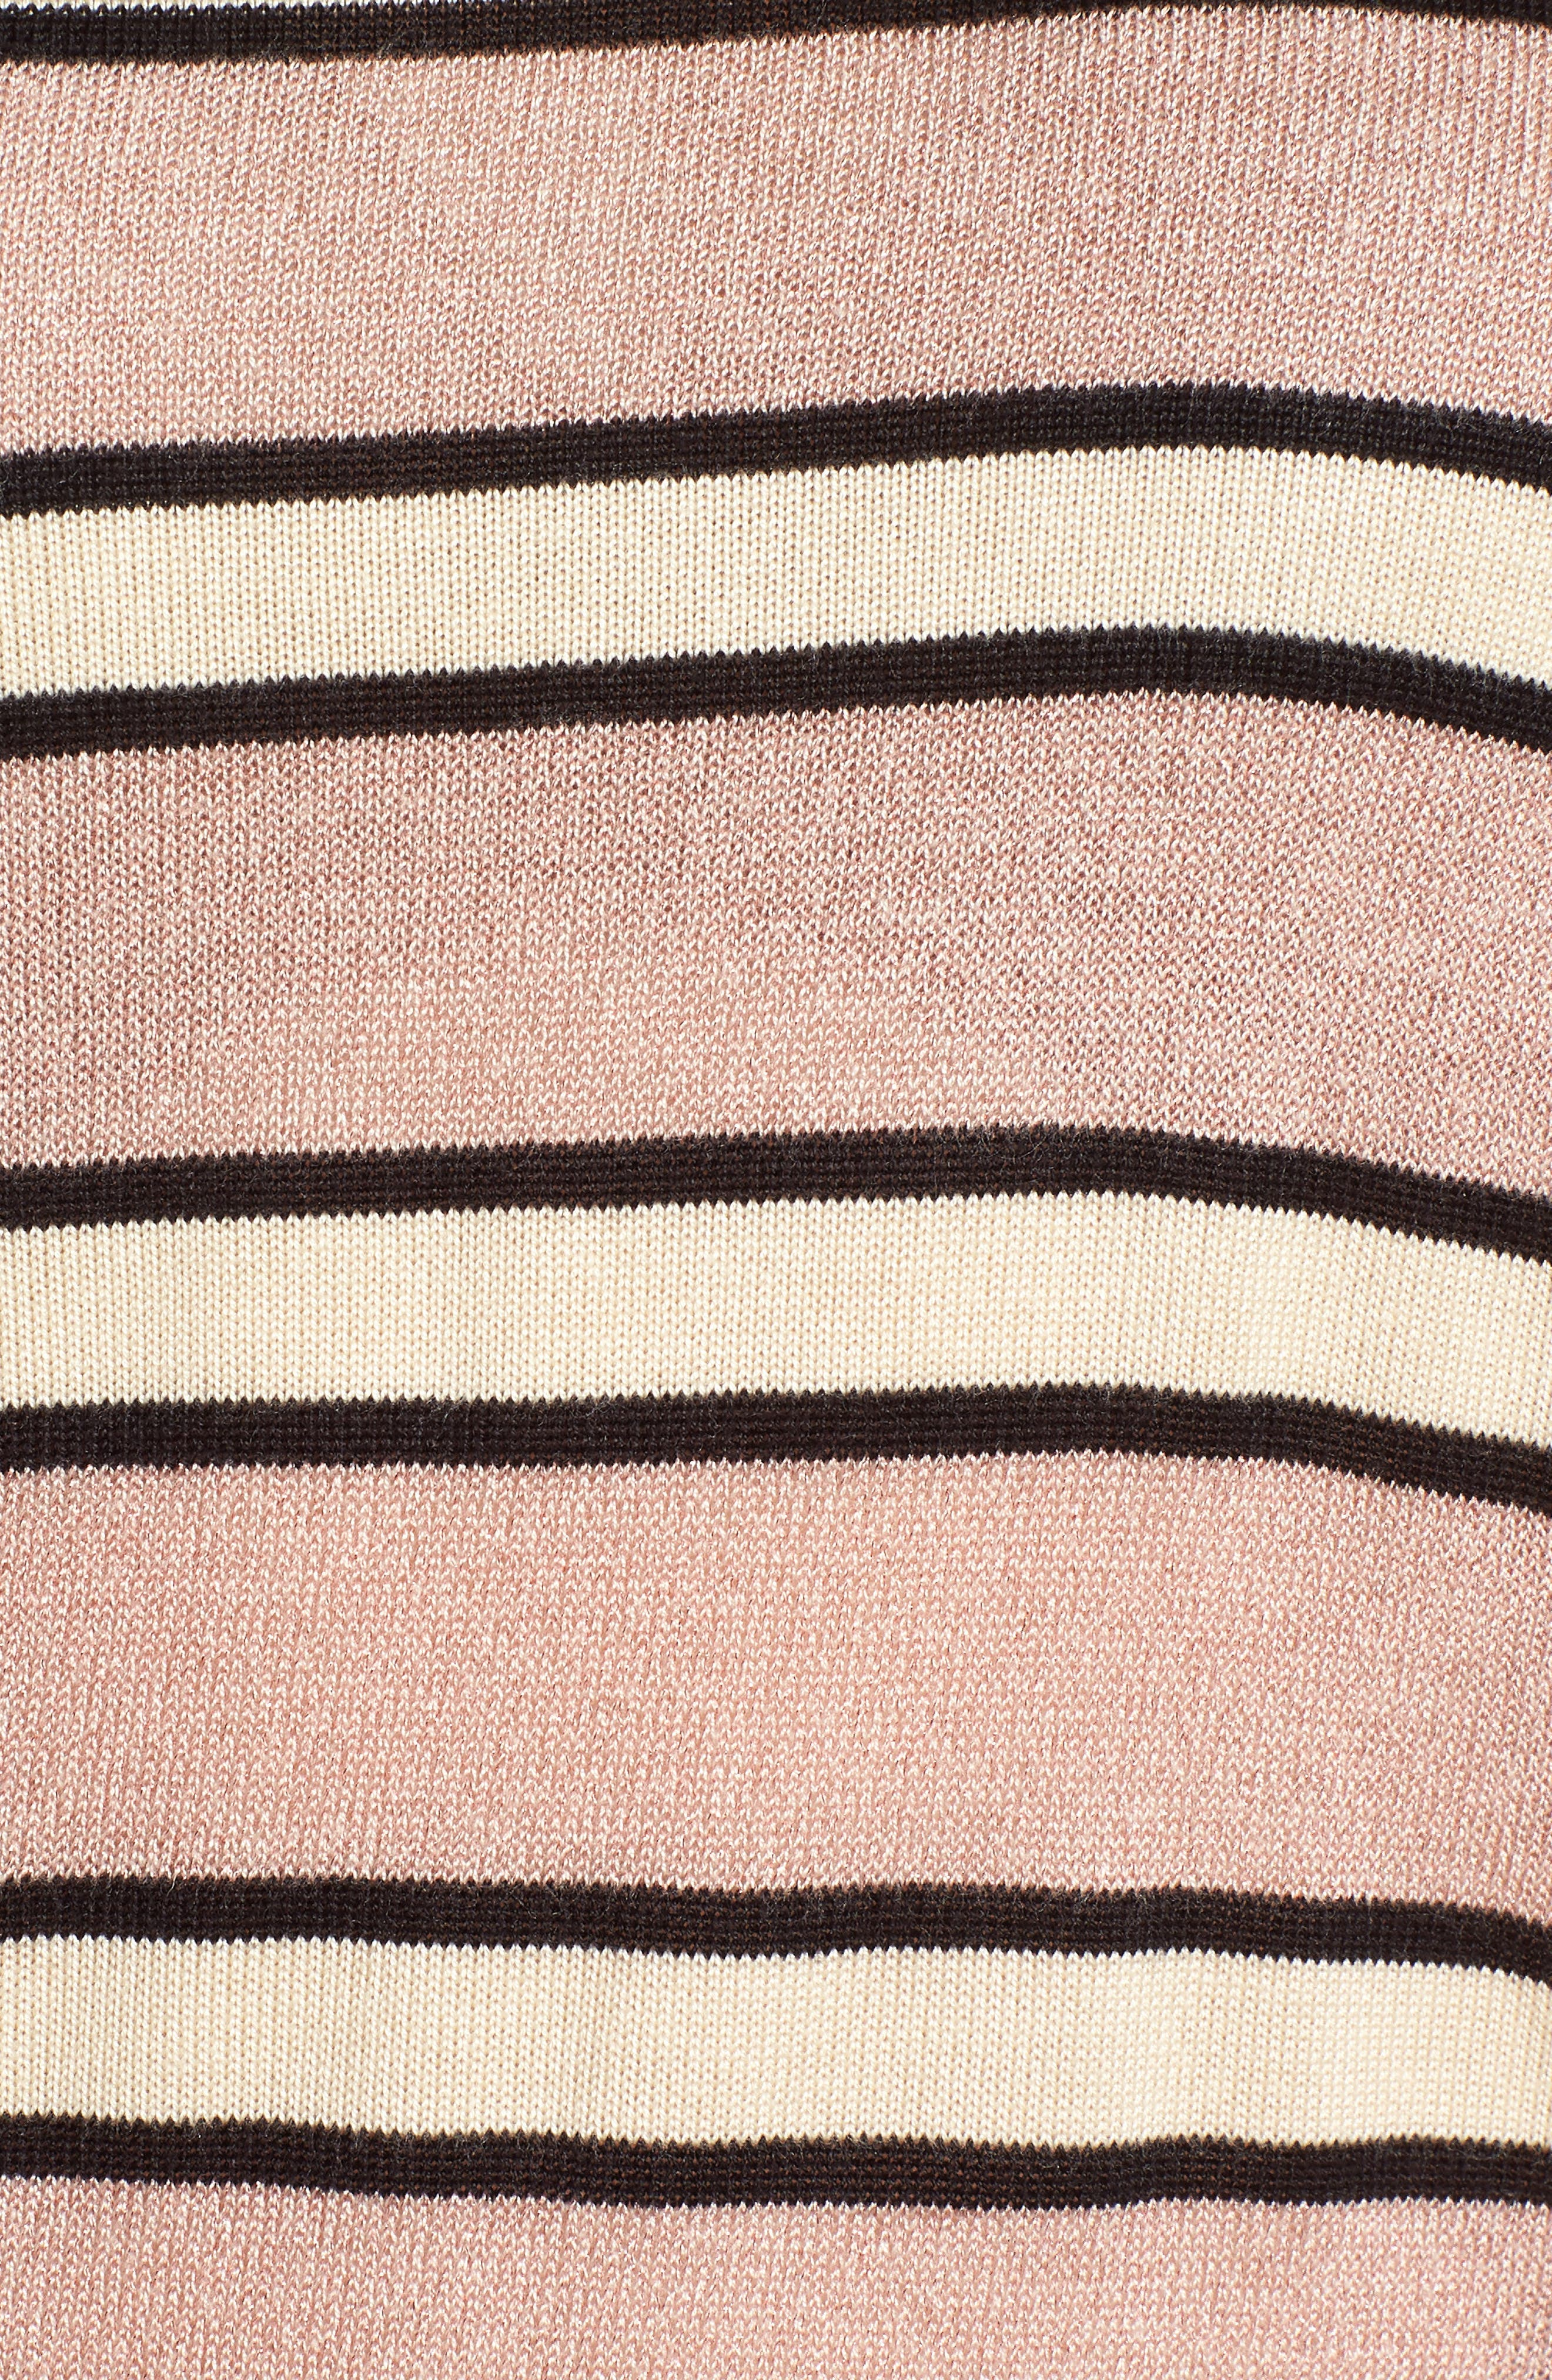 Stripe Sweater,                             Alternate thumbnail 5, color,                             650